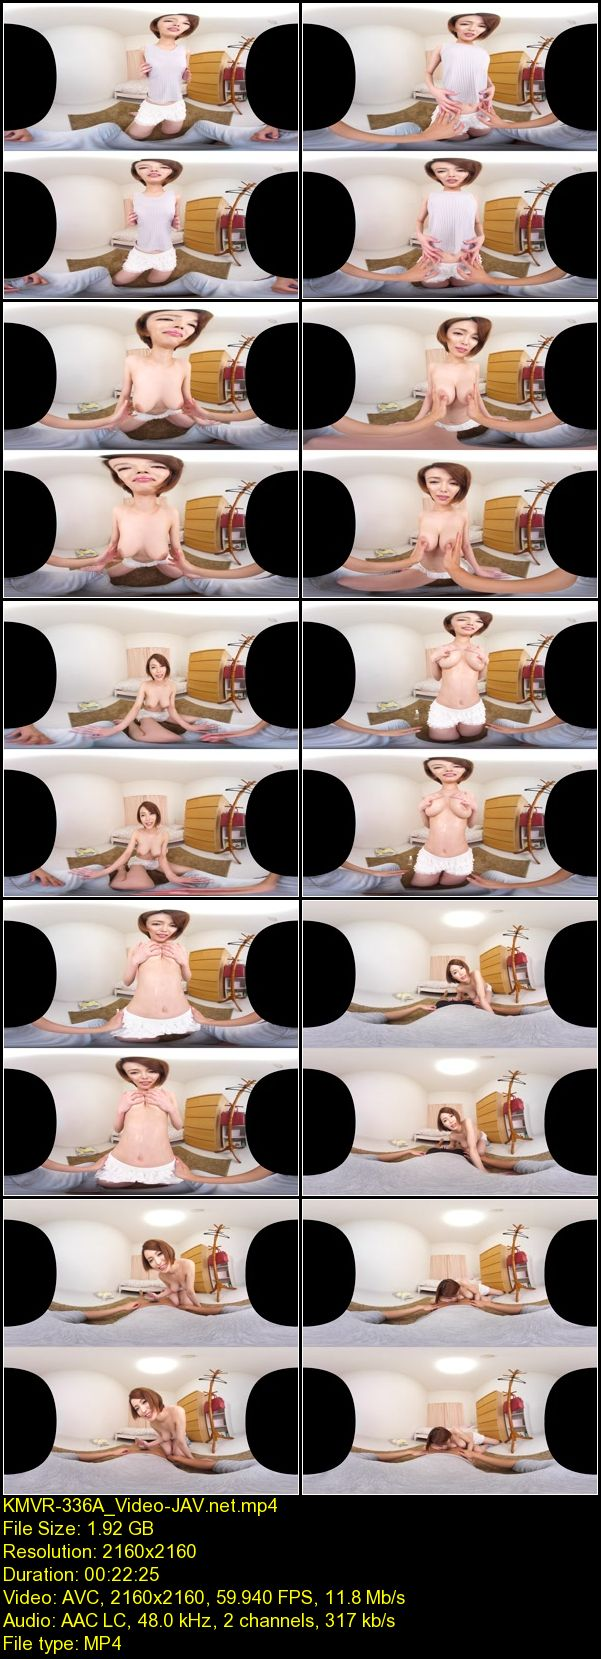 KMVR-336A_Video-JAV.net.mp4.scrlist.jpg